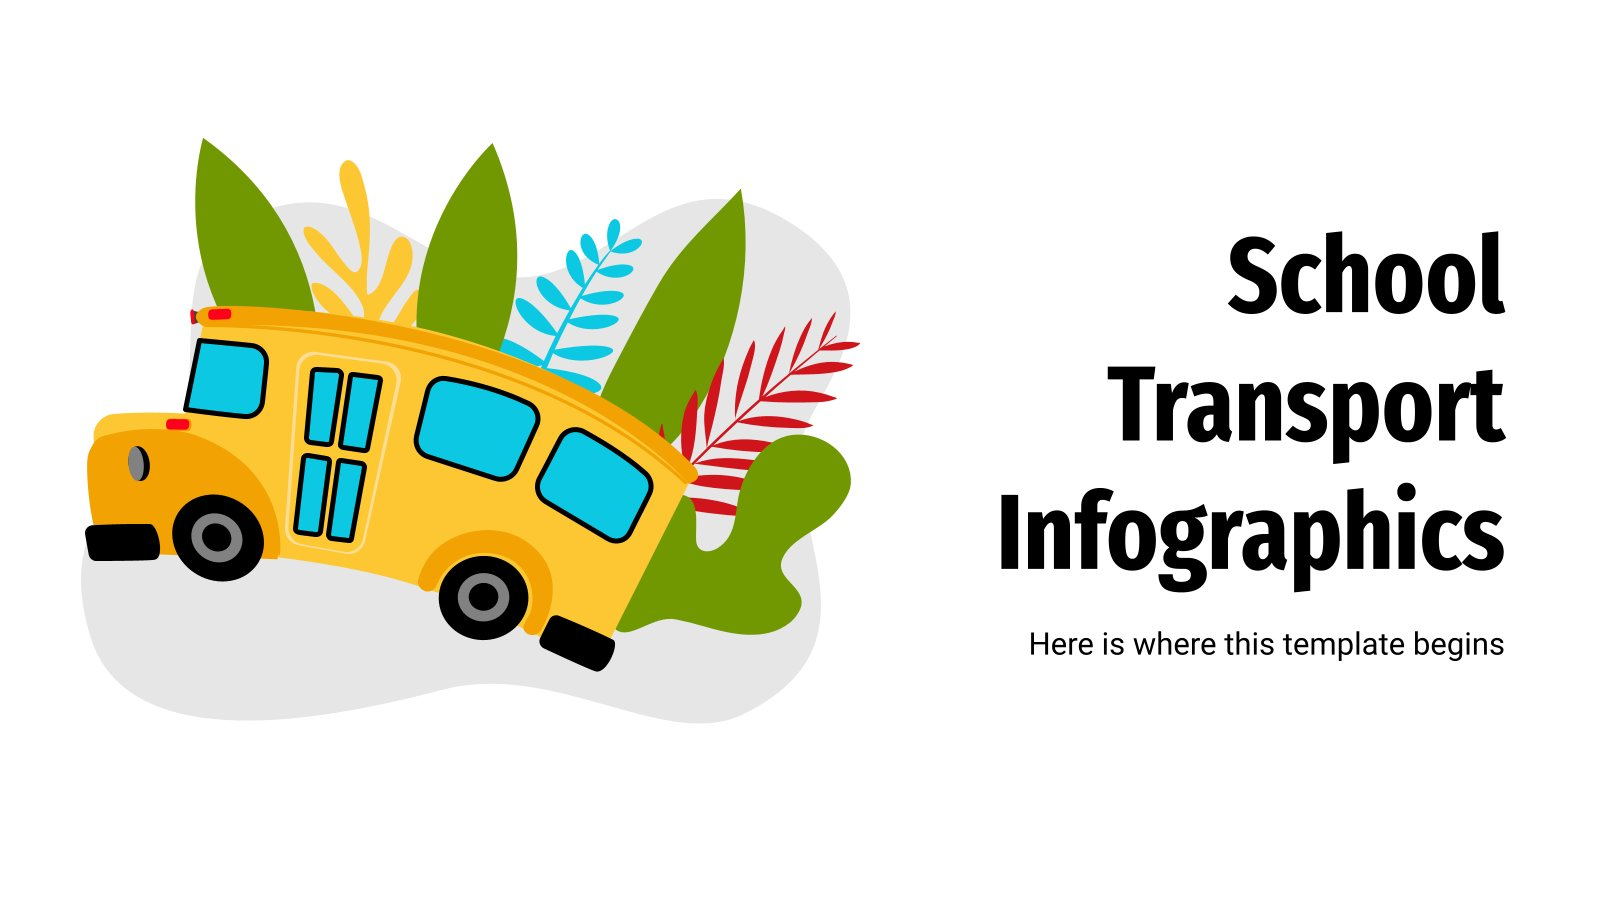 School Transport Infographics presentation template